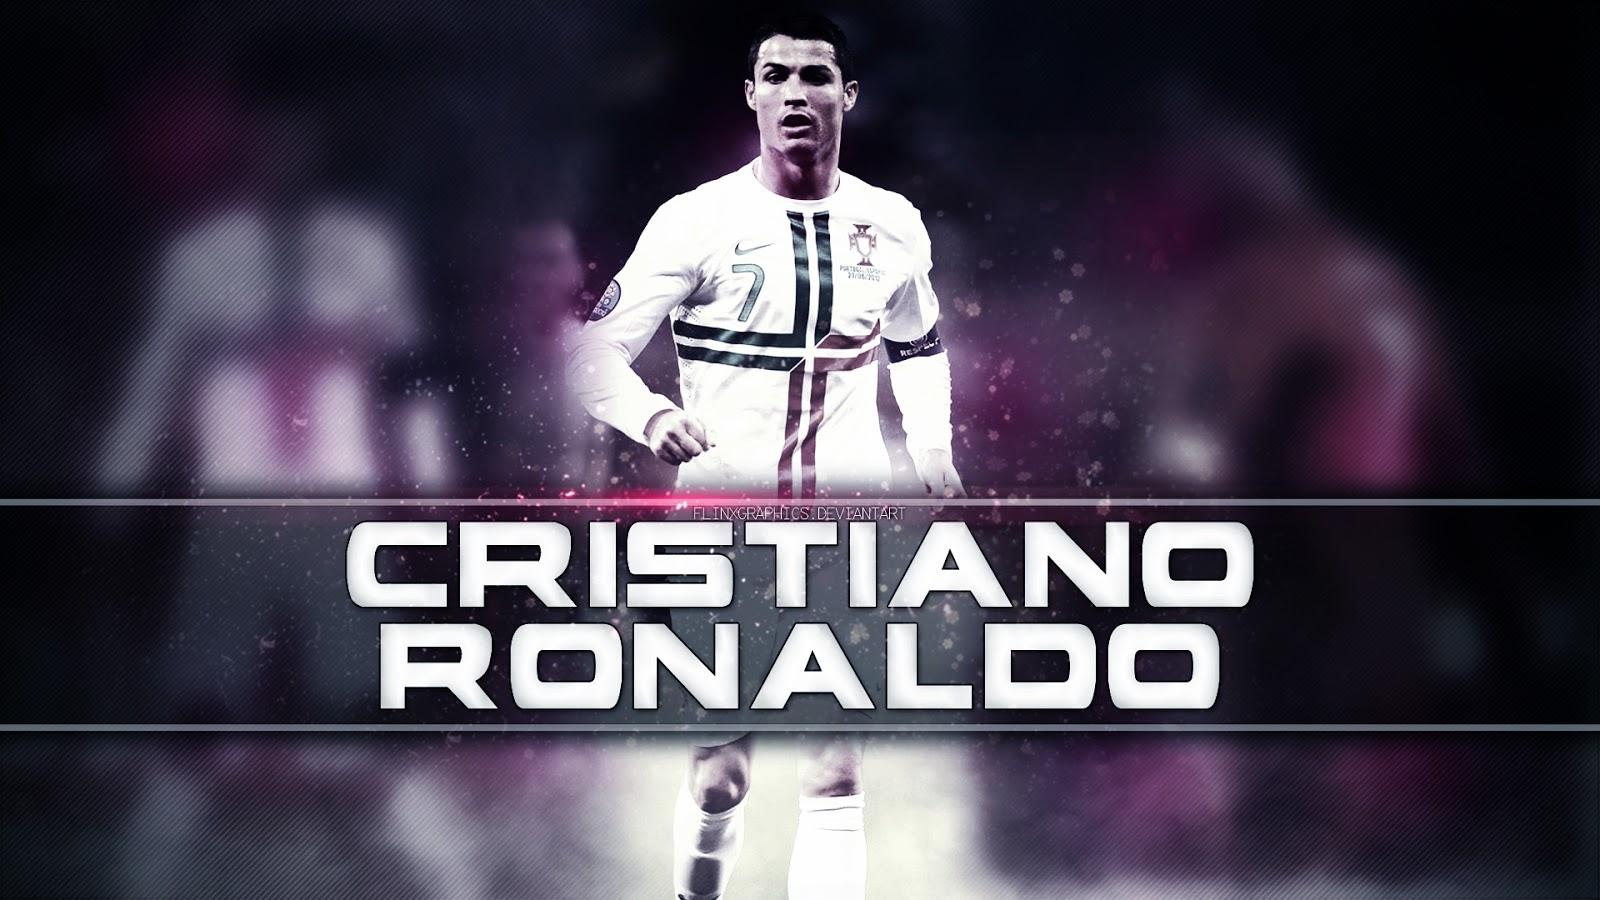 Cristiano Ronaldo New HD Wallpapers 2014-2015